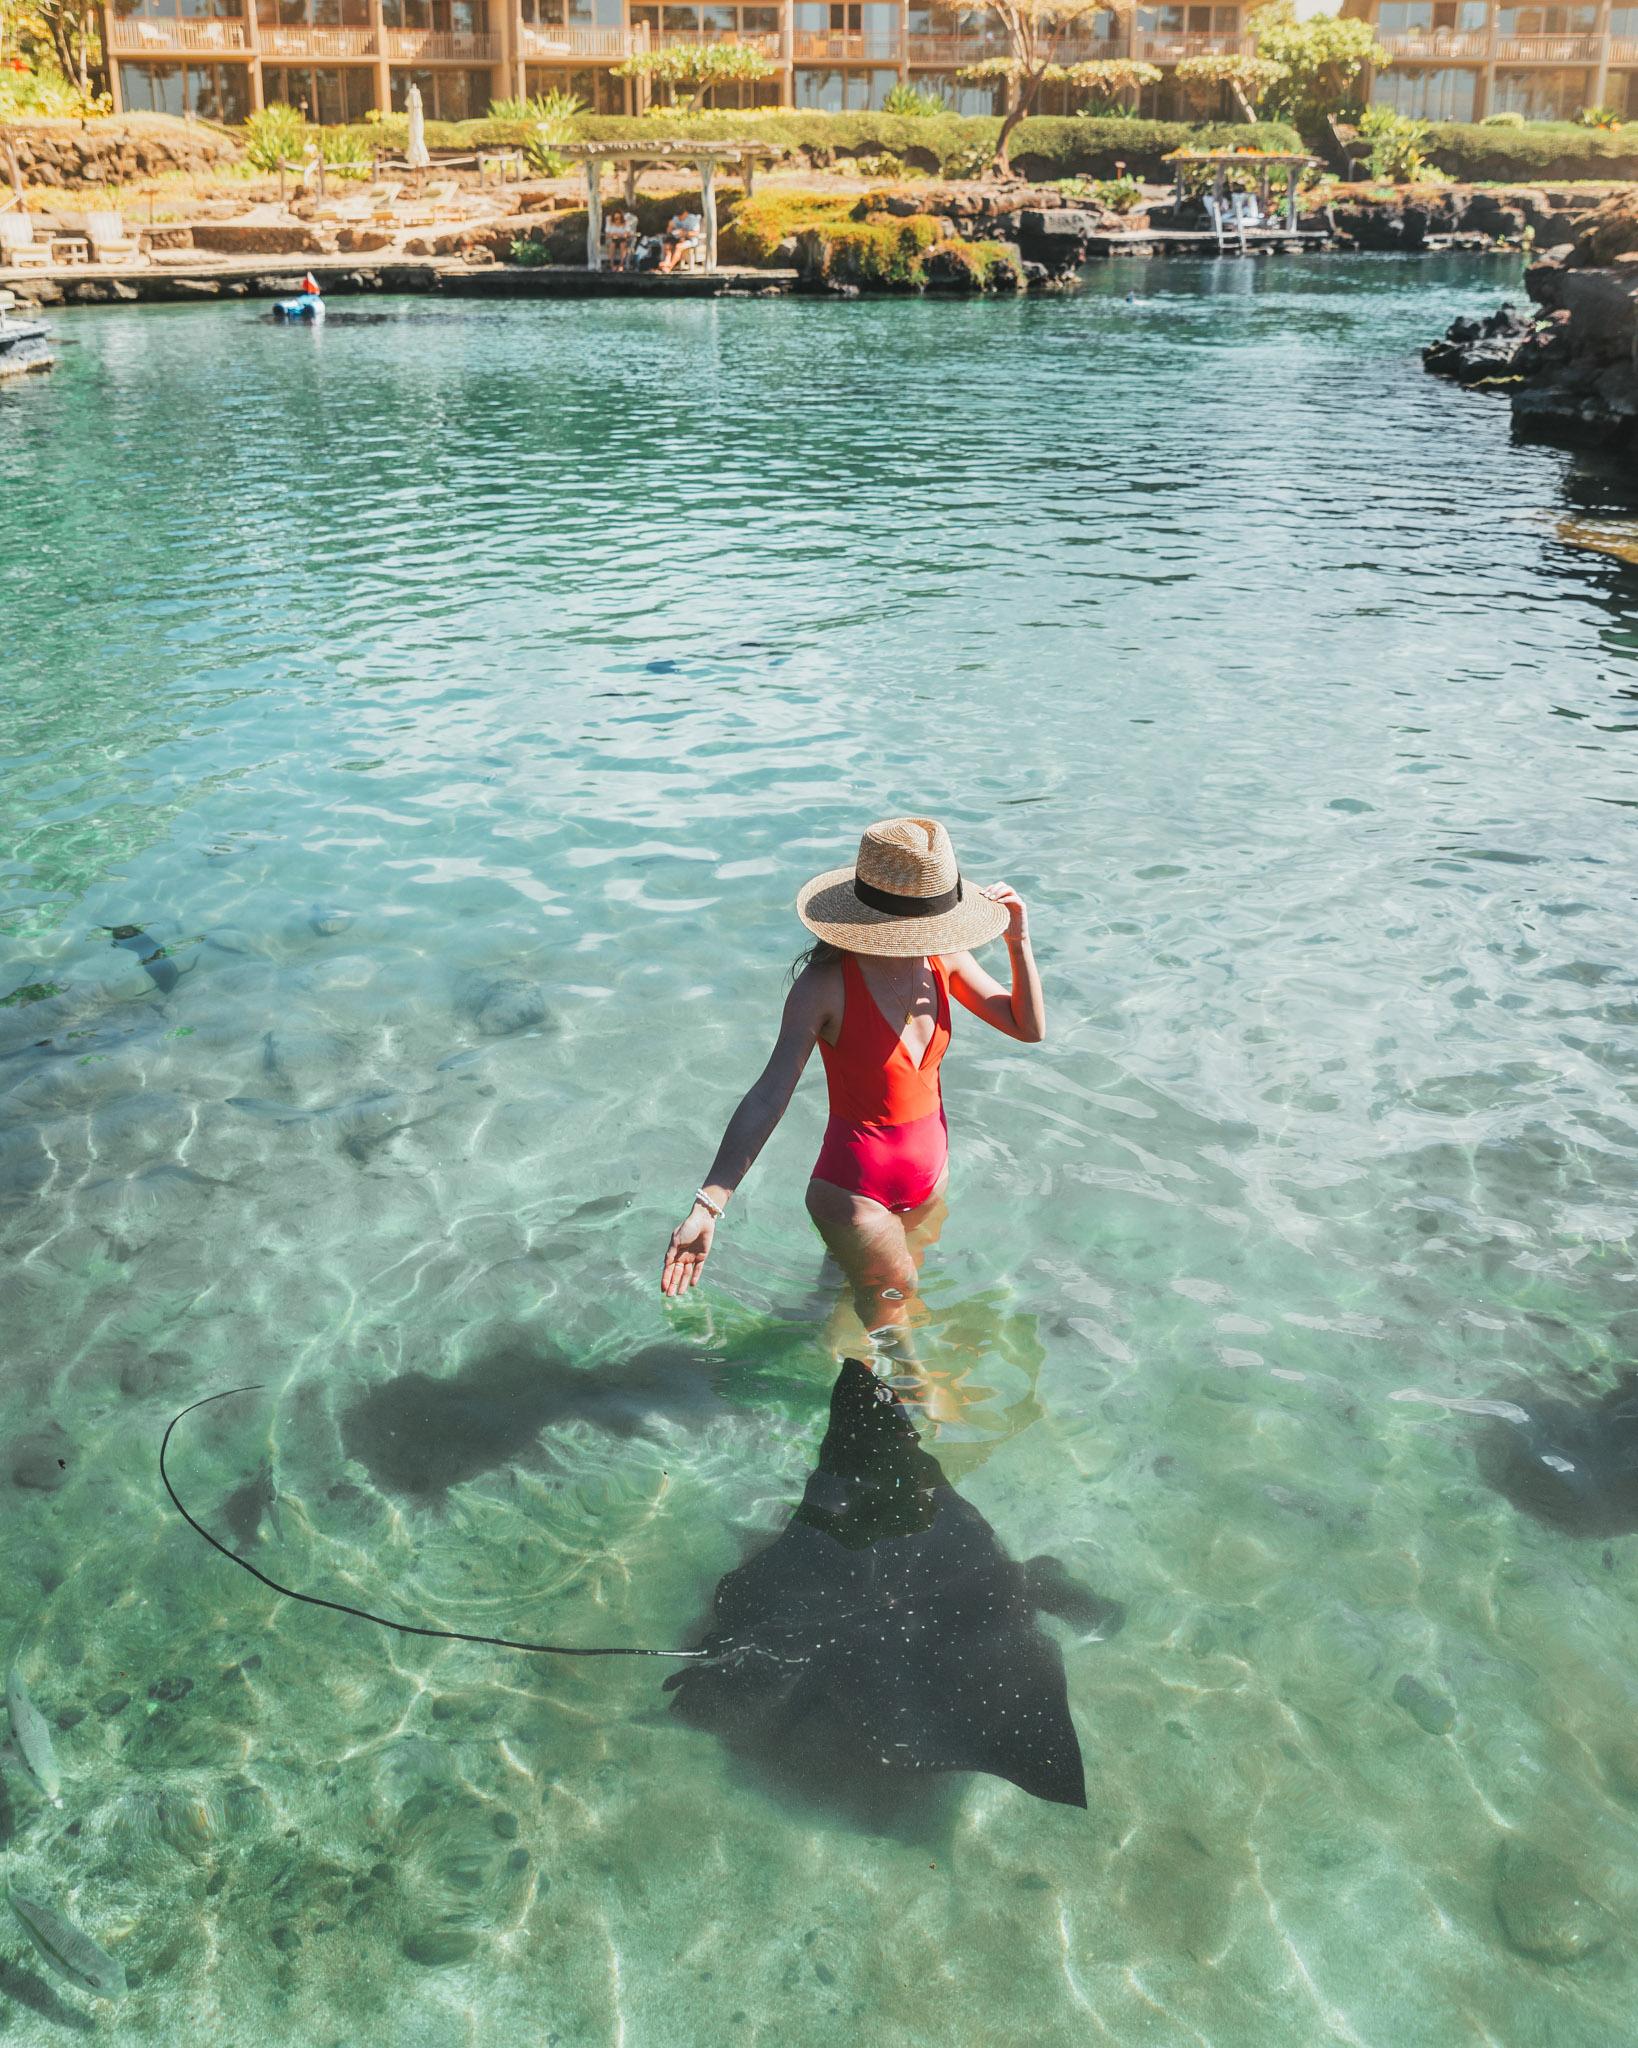 Eagle ray feeding at King's Pond // A Luxury Stay on the Big Island: Four Seasons Resort Hualalai // #readysetjetset #hawaii #bigisland #luxuryhotels #beachresorts #usa #travel